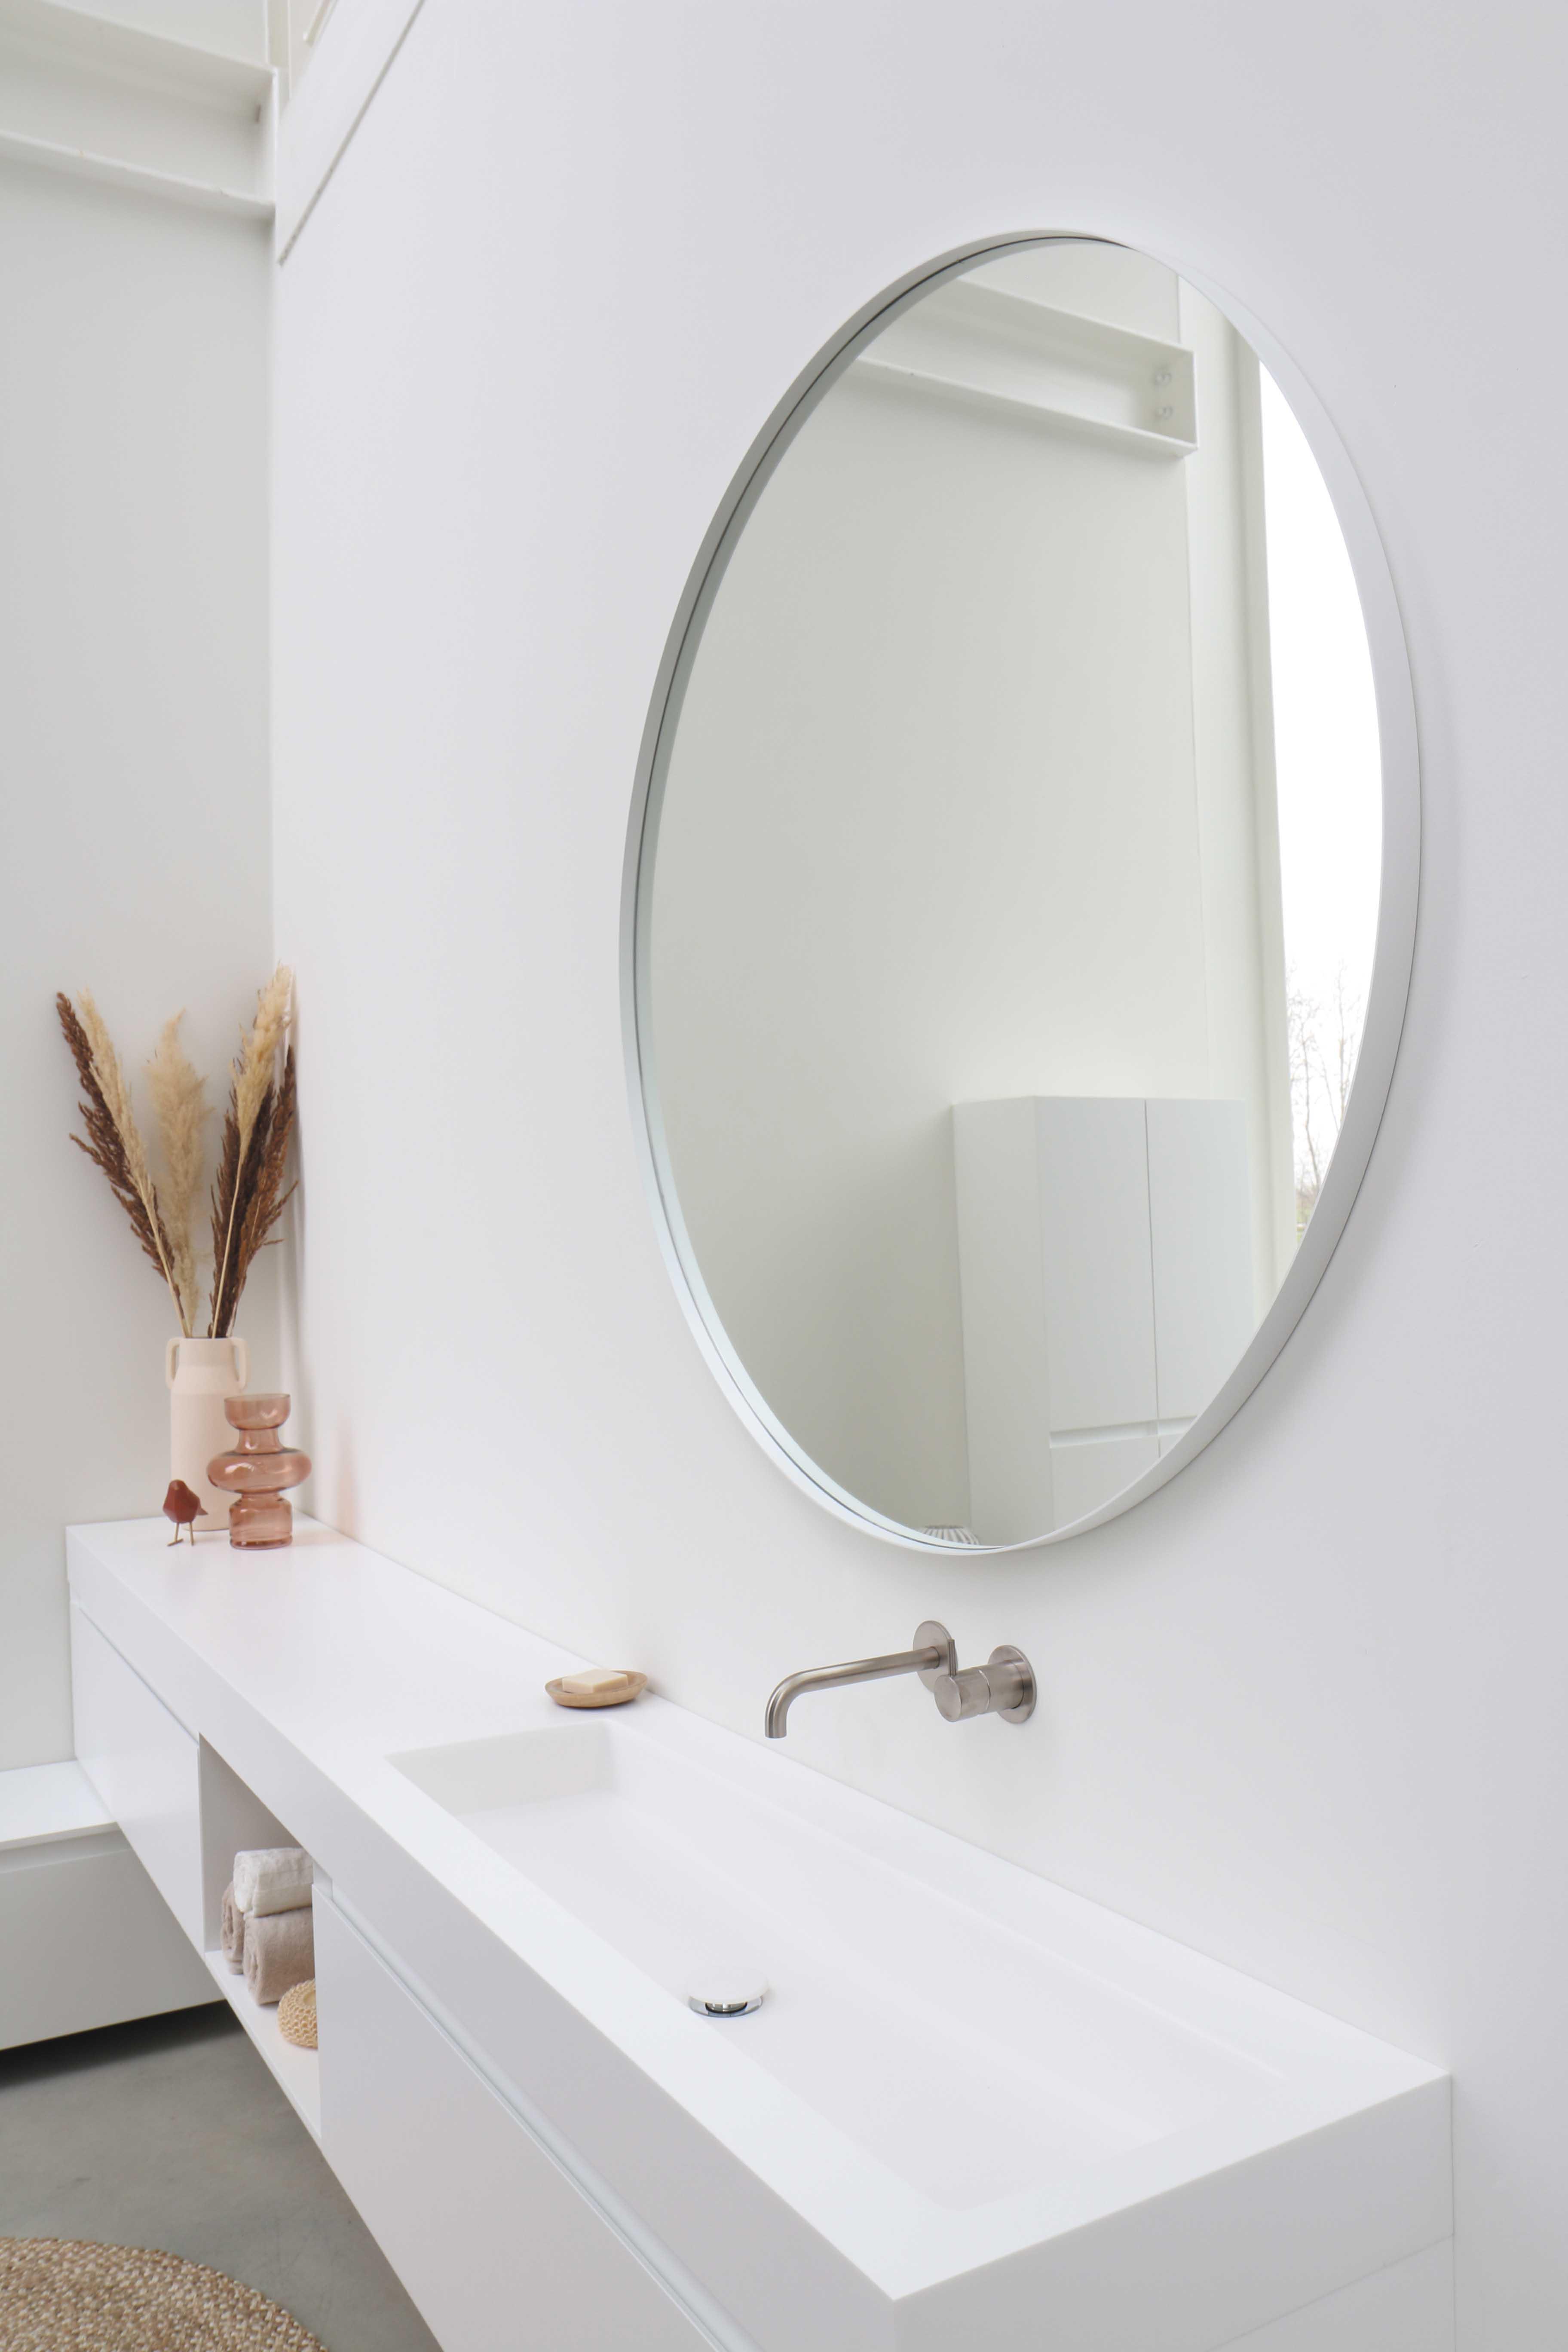 INK spiegel verzonken in kader rond 100 cm, aluminium, mat wit